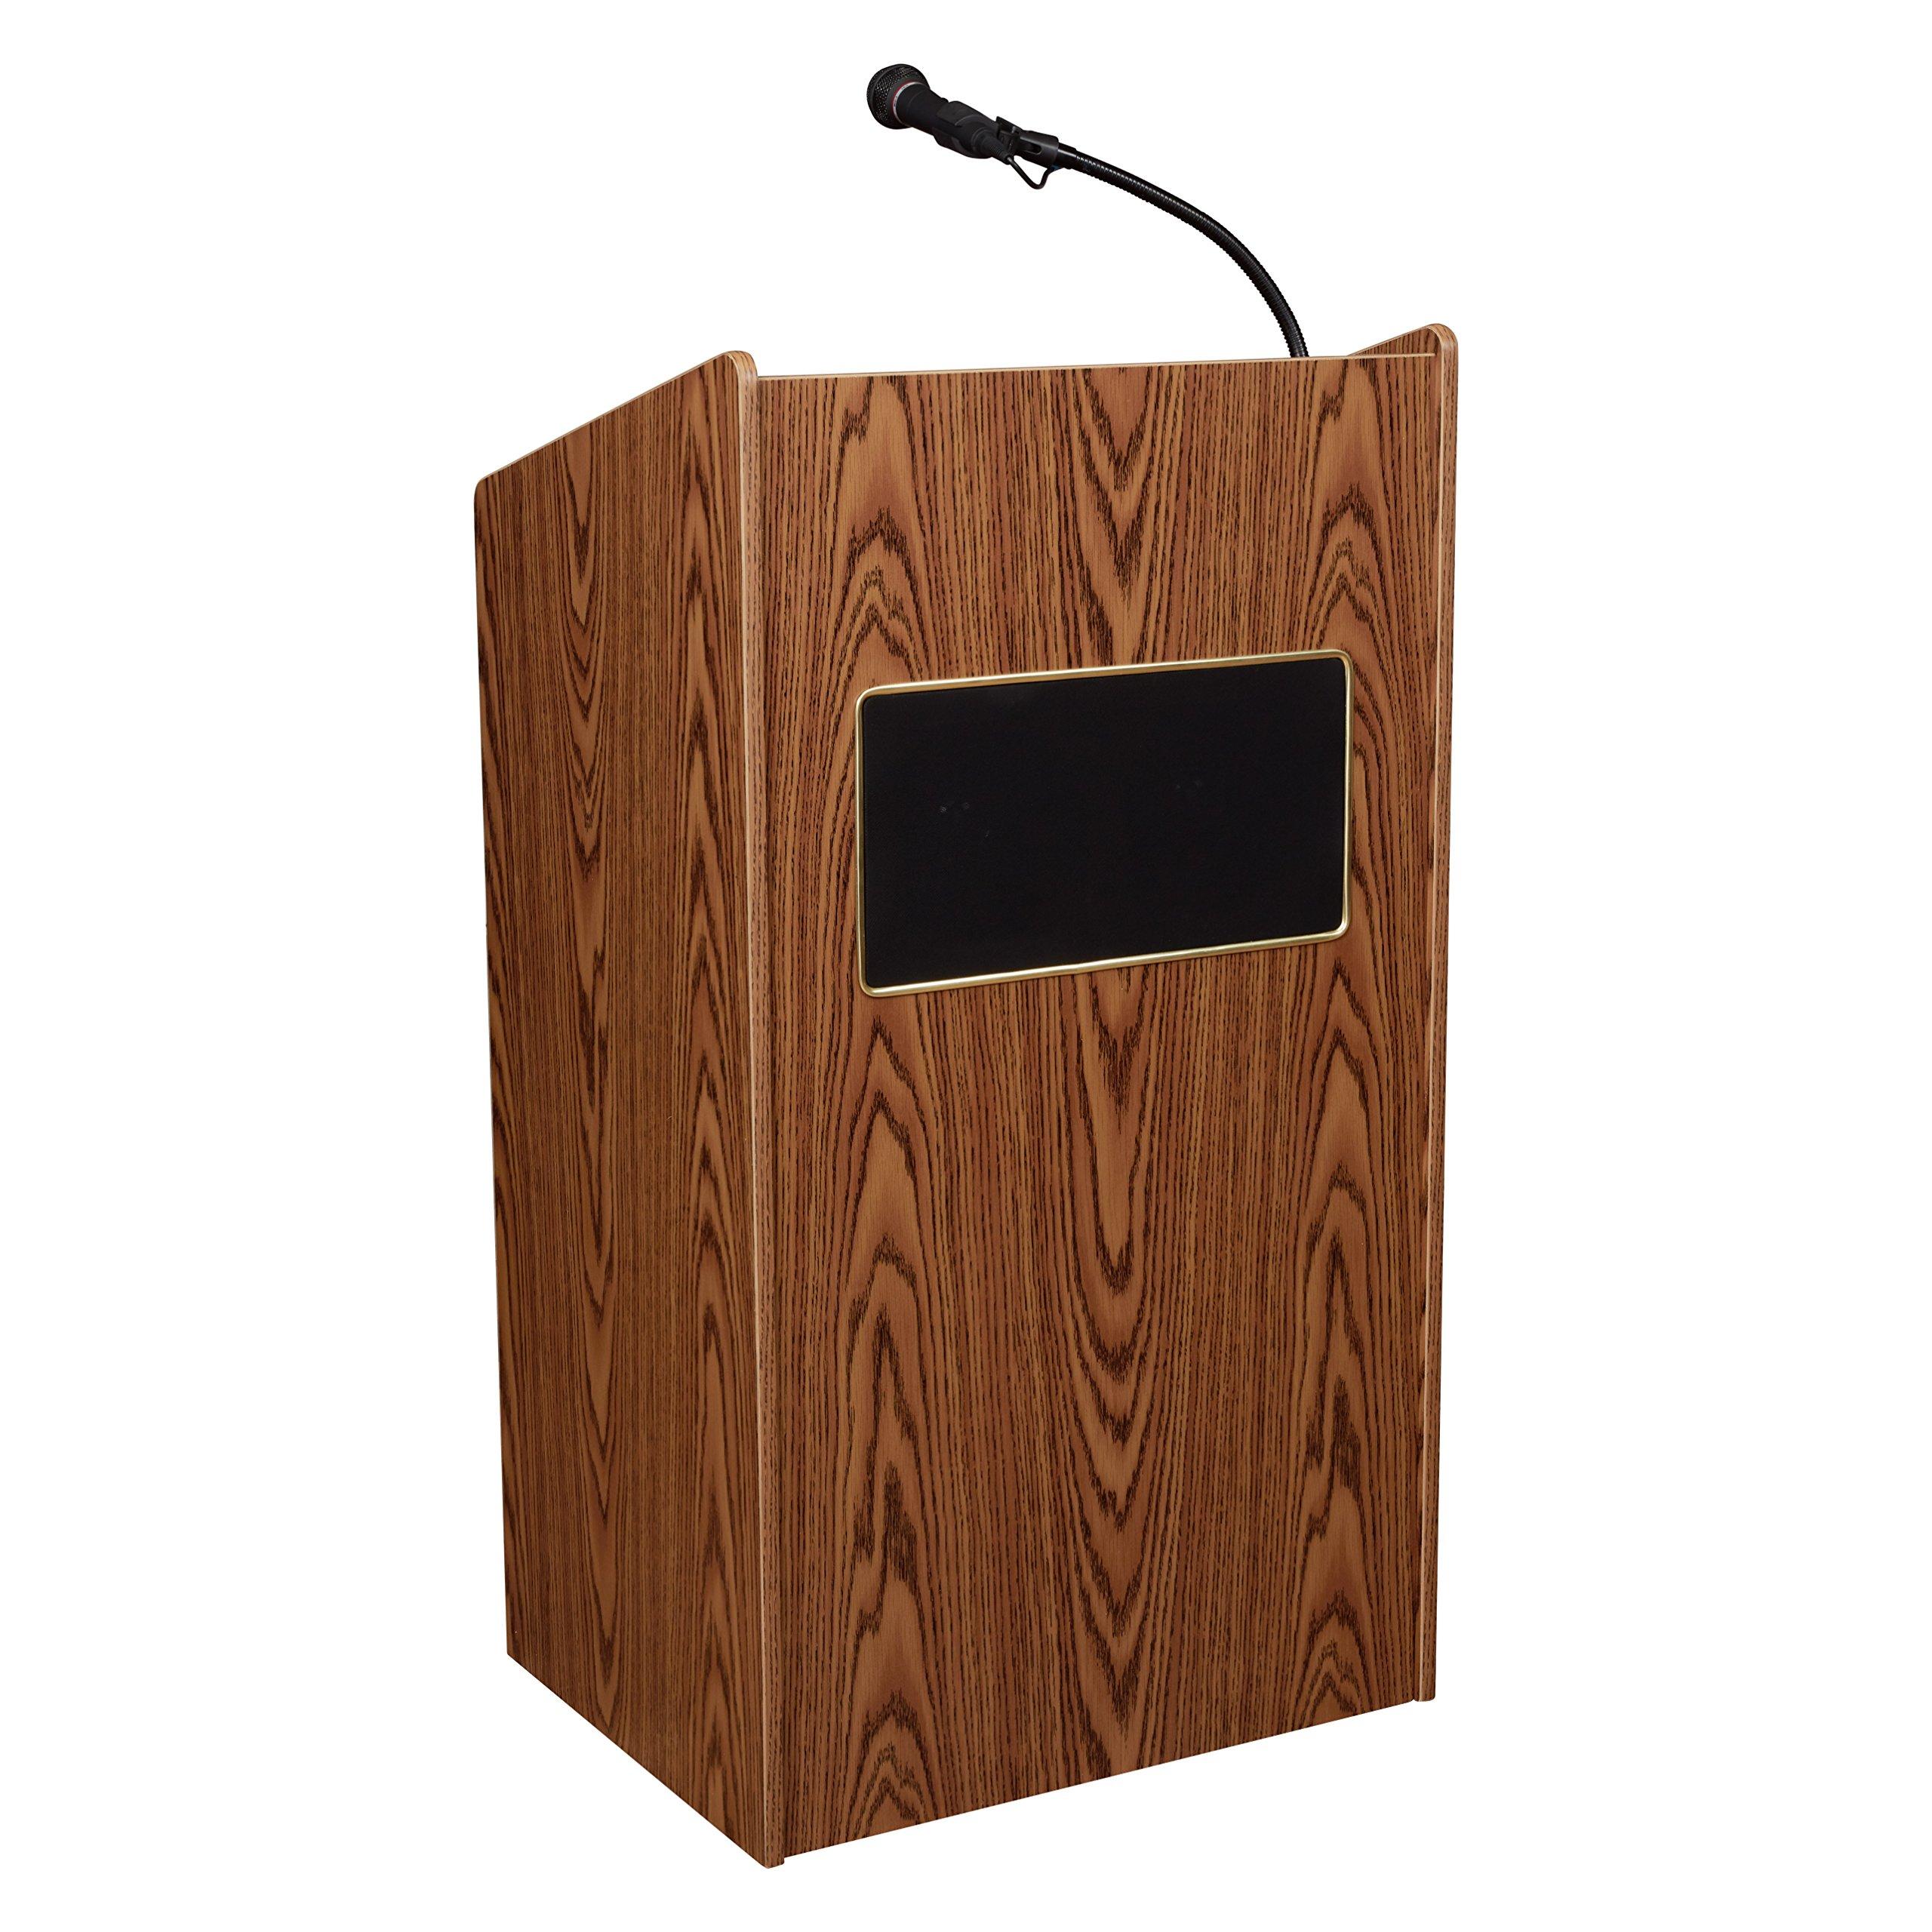 Oklahoma Sound 6010-MO Aristocrat Floor Sound Lectern, 25'' Width x 46'' Height x 20'' Depth, Sound, Medium Oak